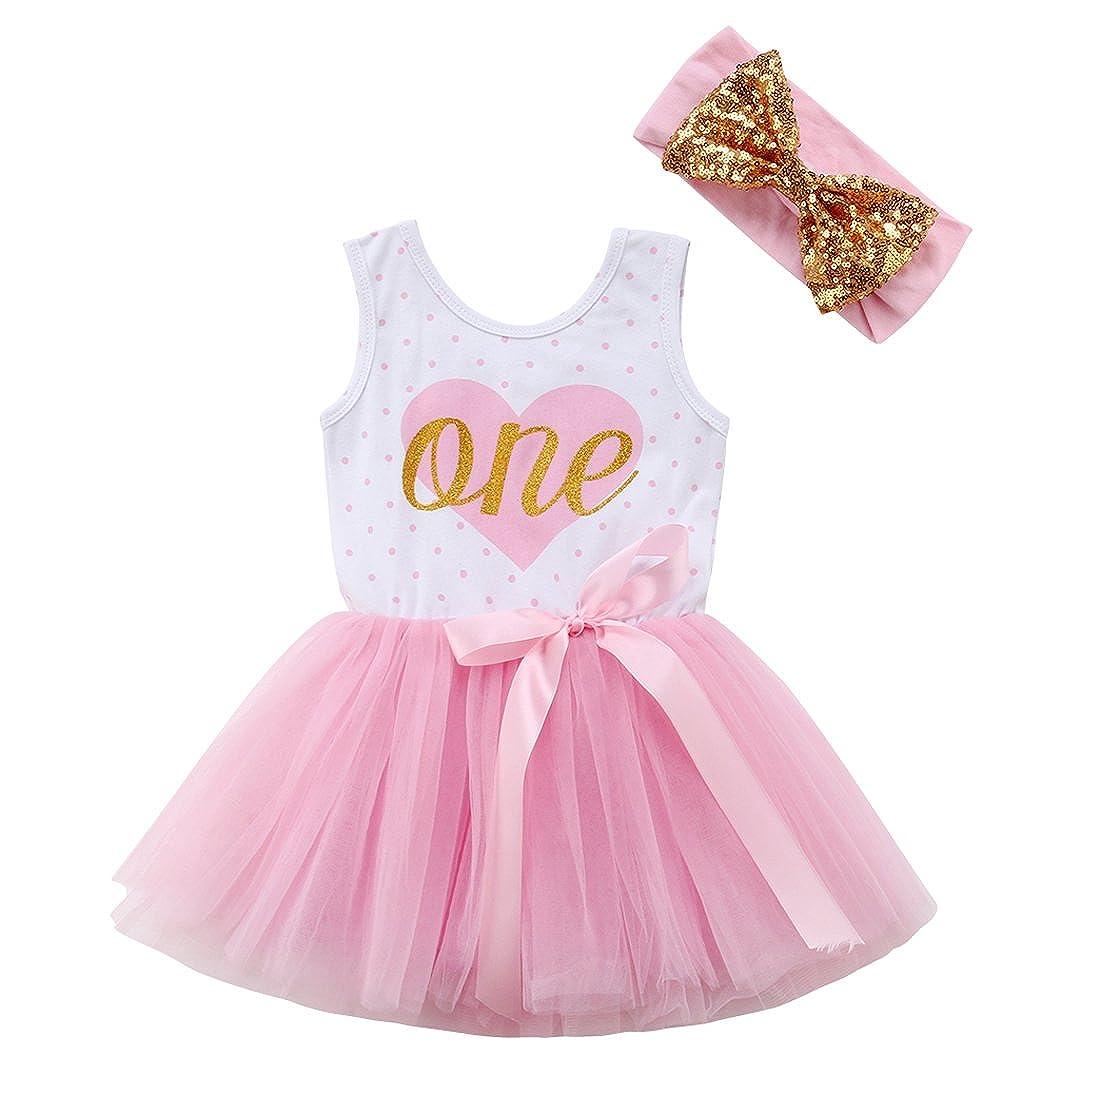 Imcute Toddler Baby Girls Birthday Dress Casual Sleeveless Tutu Dresses One Piece